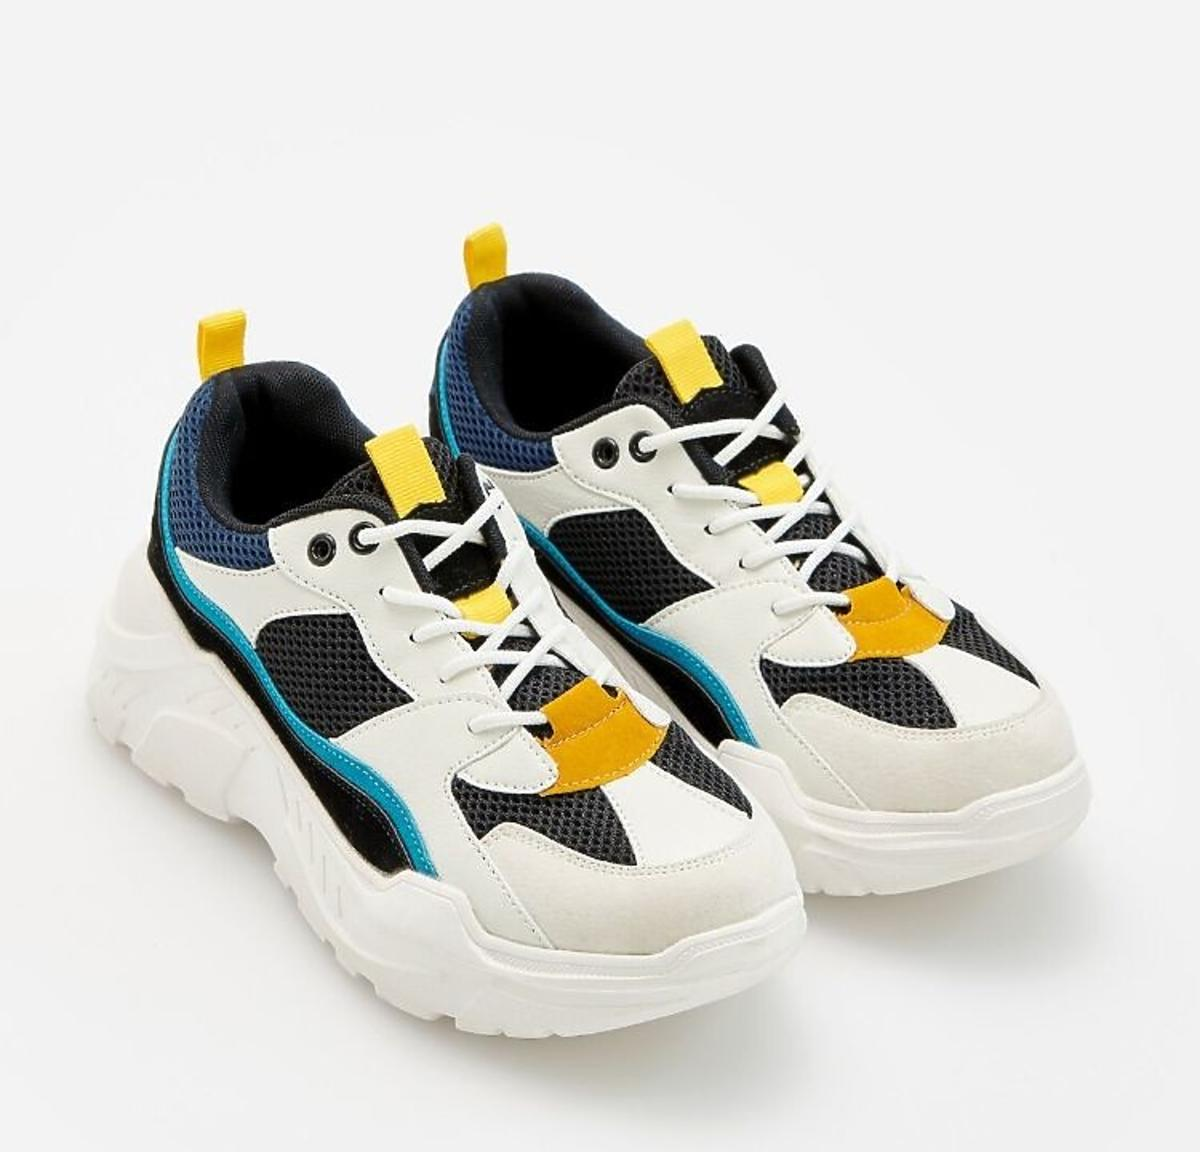 Kolorowe sneakersy Reserved kolekcja wiosna-lato 2020